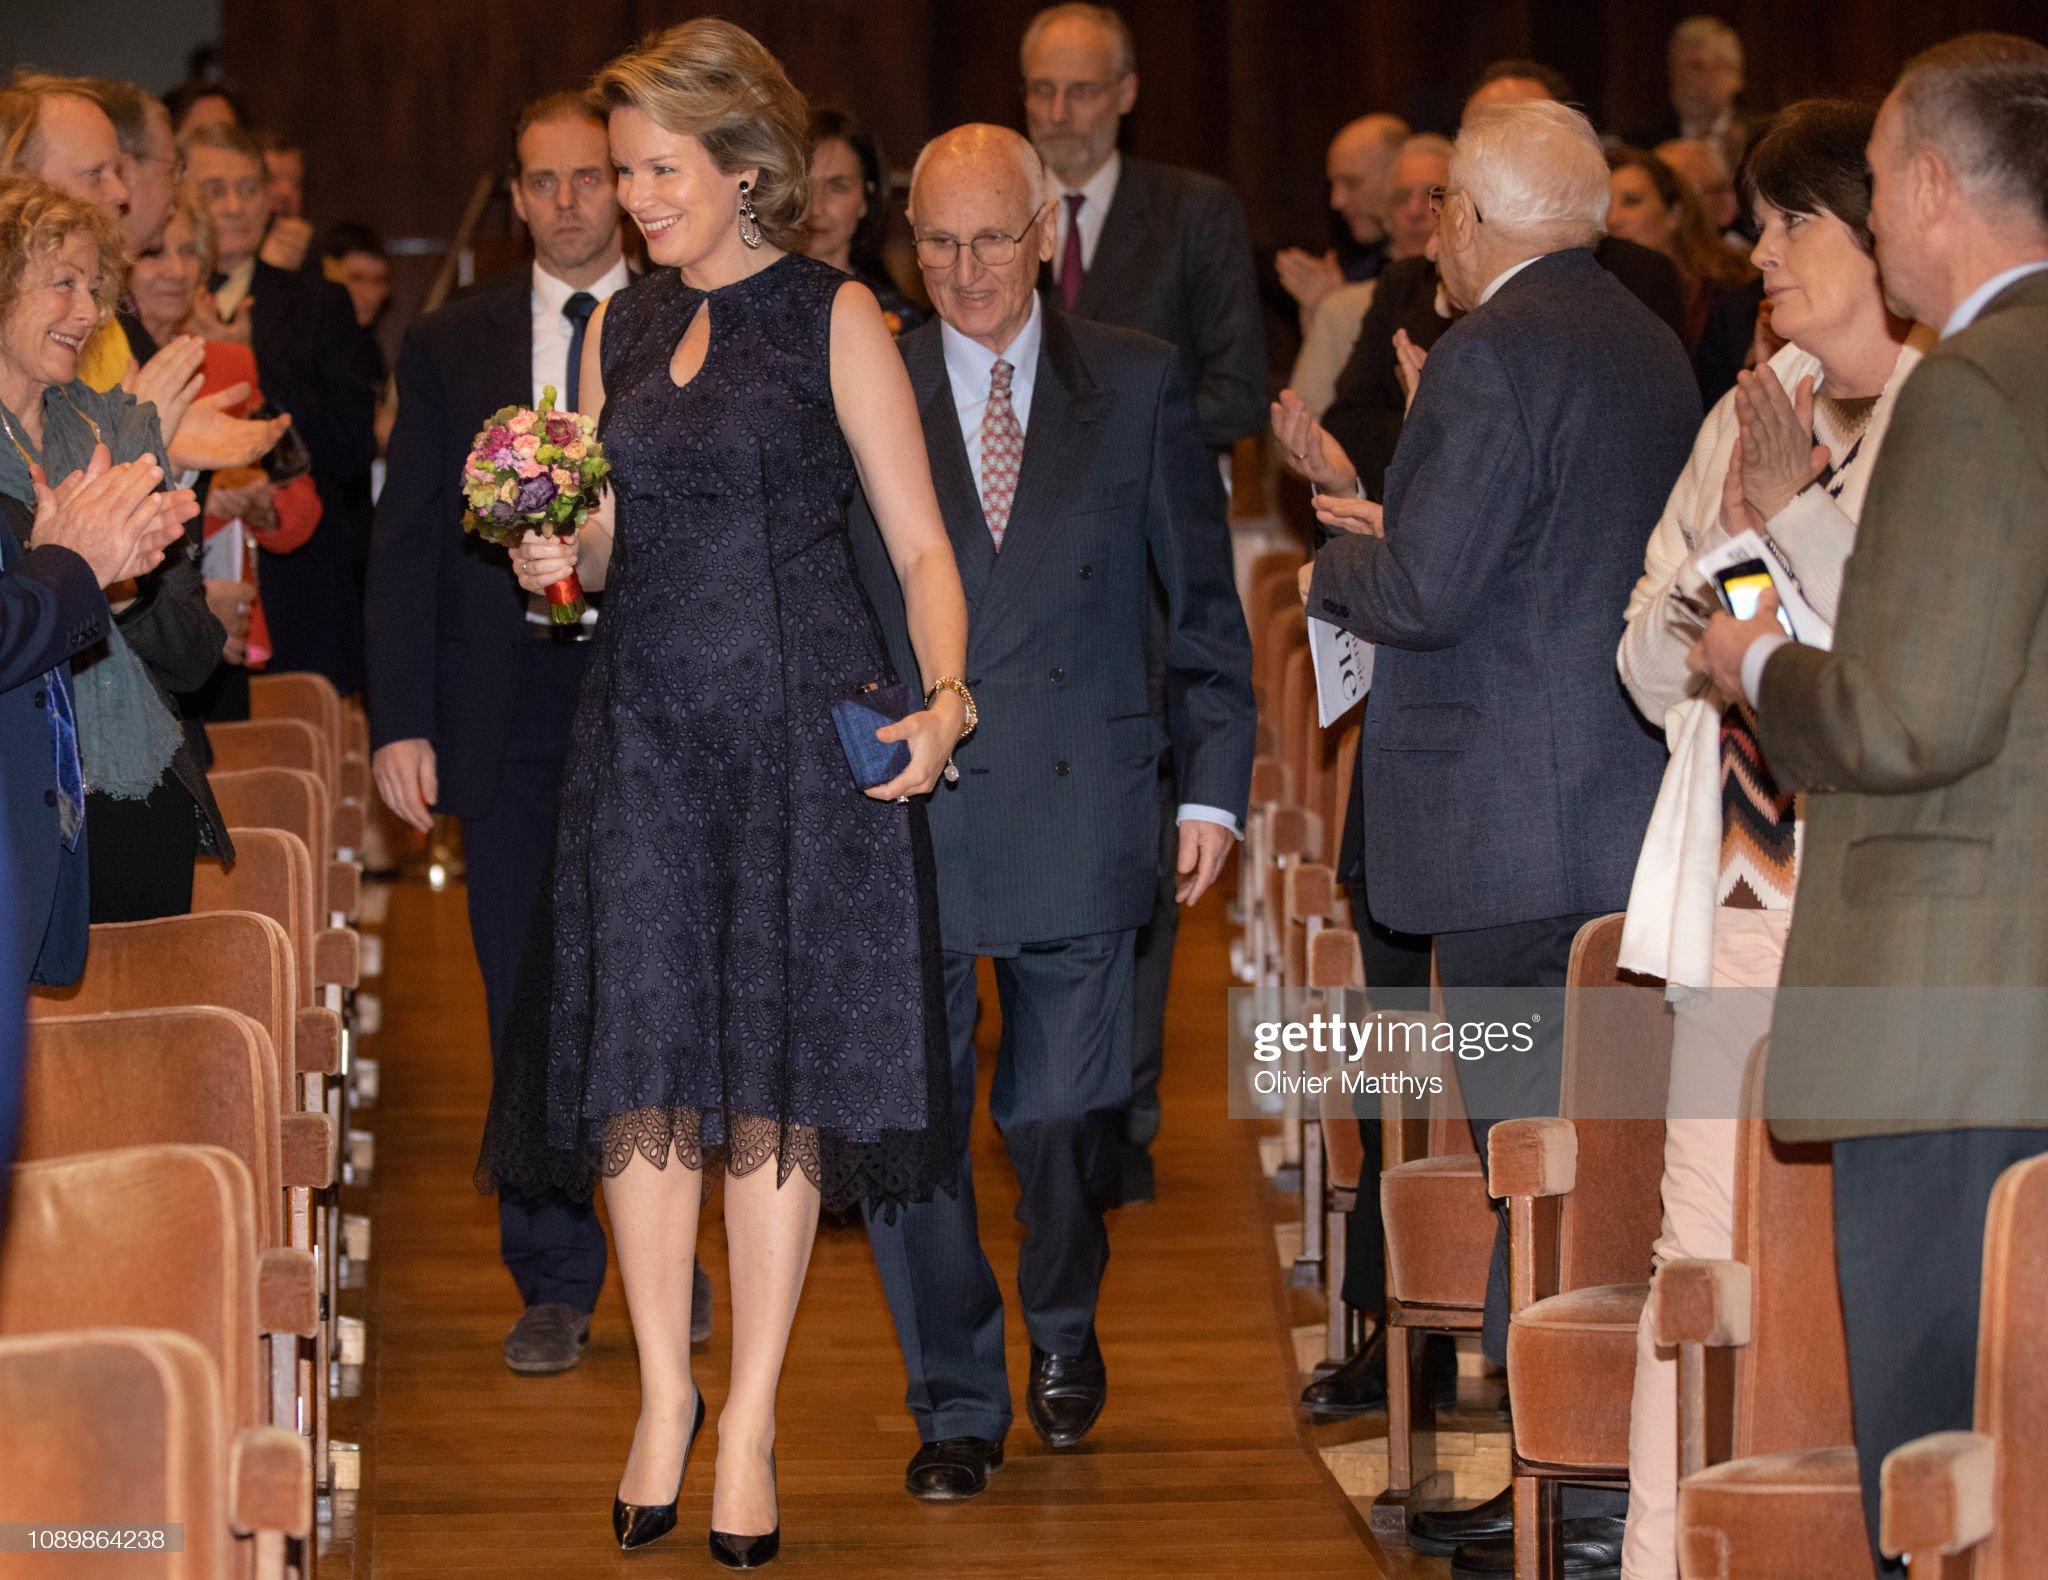 Вечерние наряды Королевы Матильды Queen Mathilde Of Belgium Attends A Musical Evening Concert To honor The Farewell Of Queen Elisabeth Contest In Flagey : News Photo